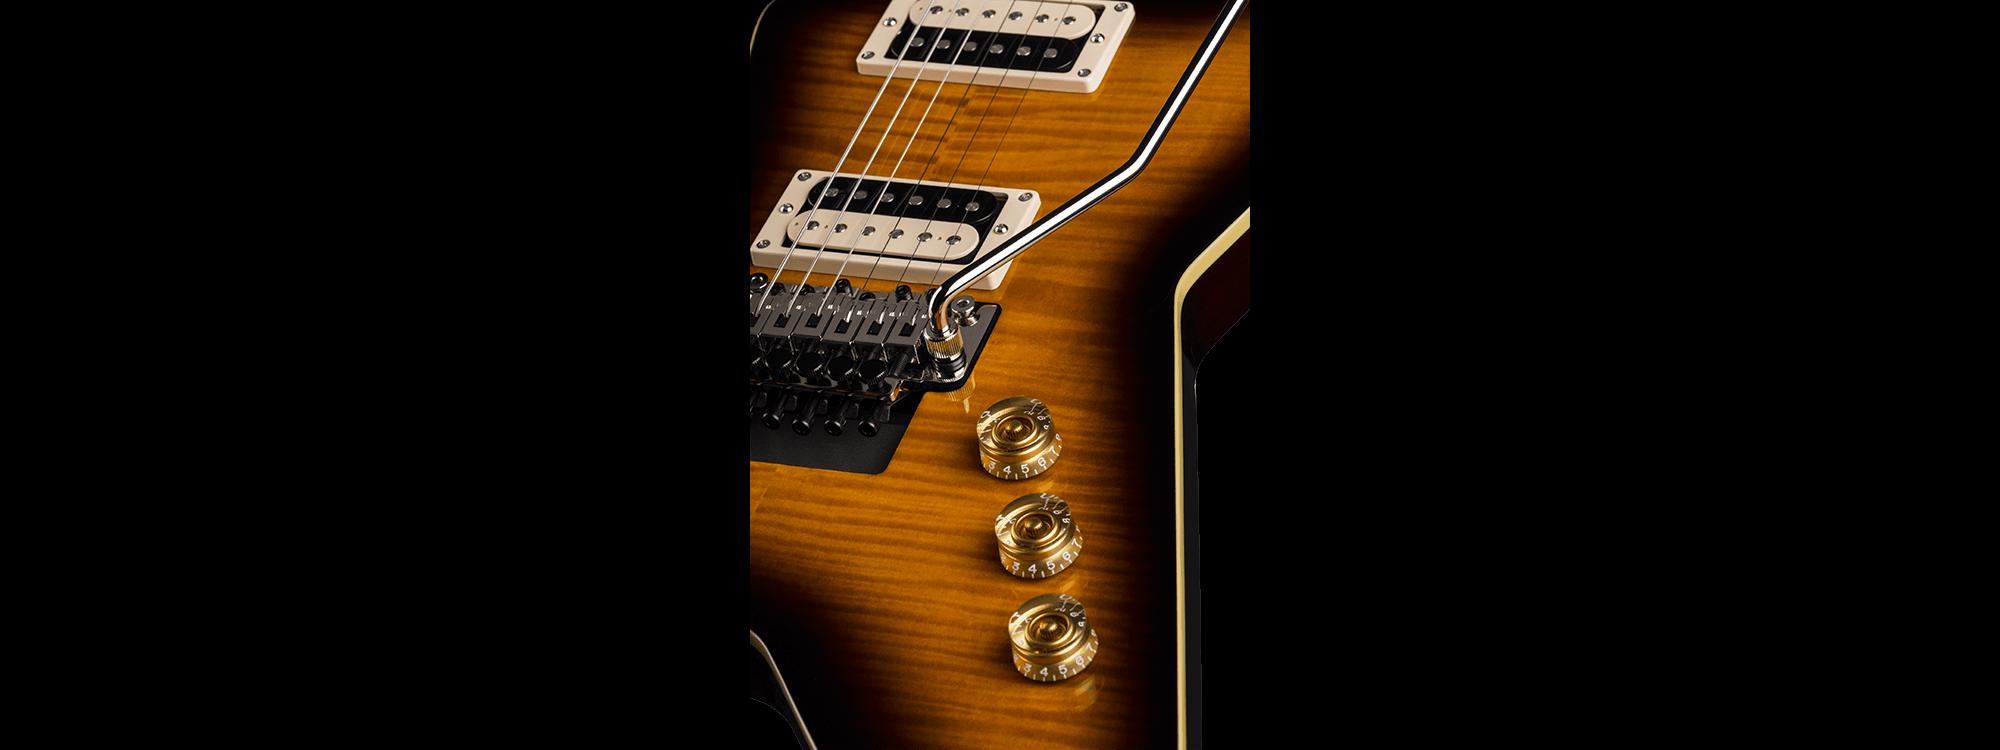 Ml 79 Floyd Trans Brazilia Dean Guitars Wiring Diagram For Image